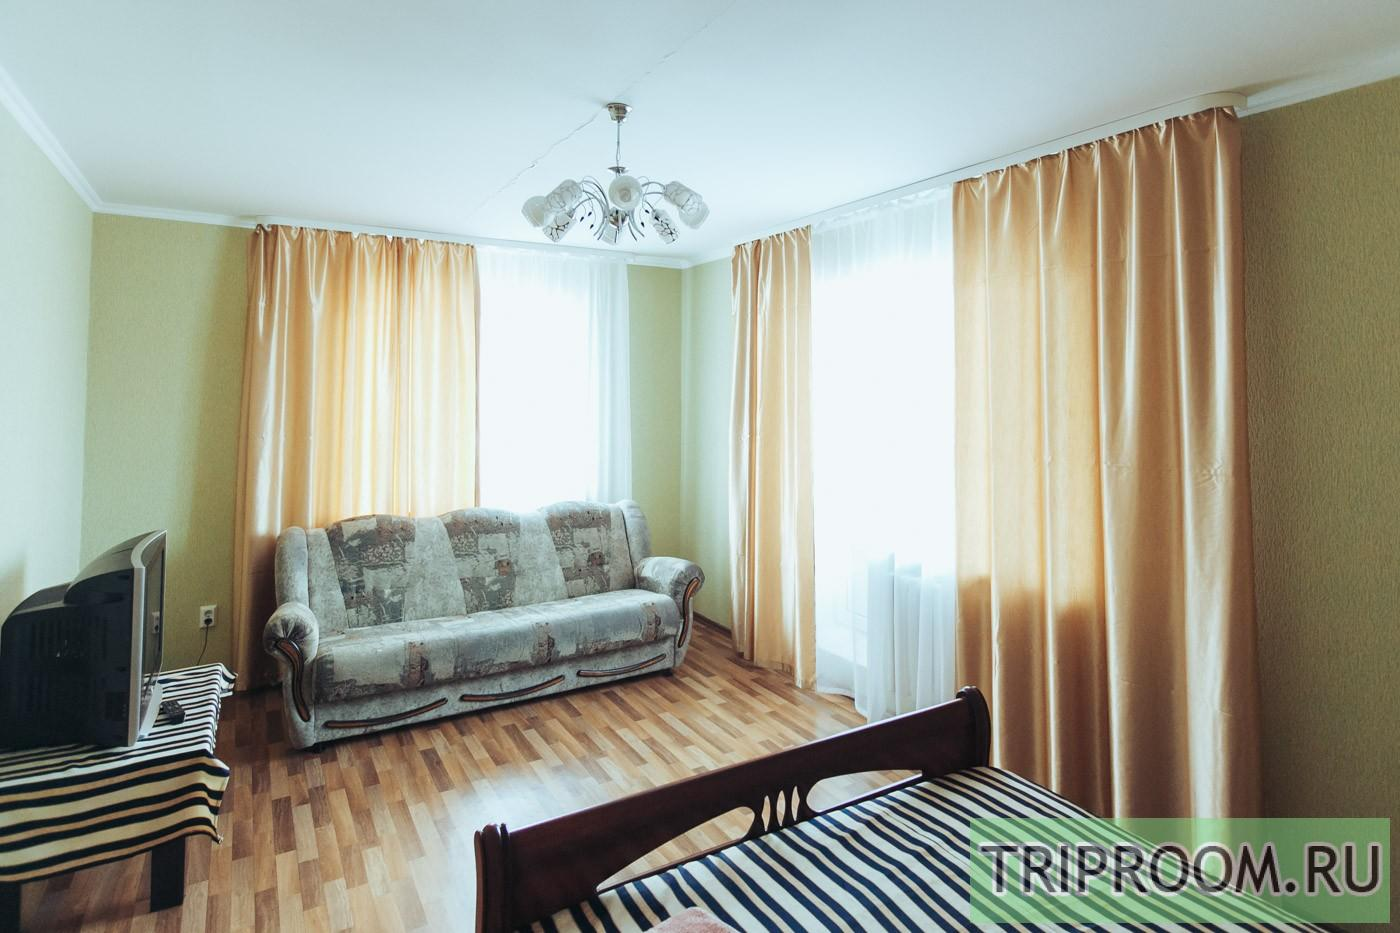 1-комнатная квартира посуточно (вариант № 30979), ул. Петра Смородина улица, фото № 3